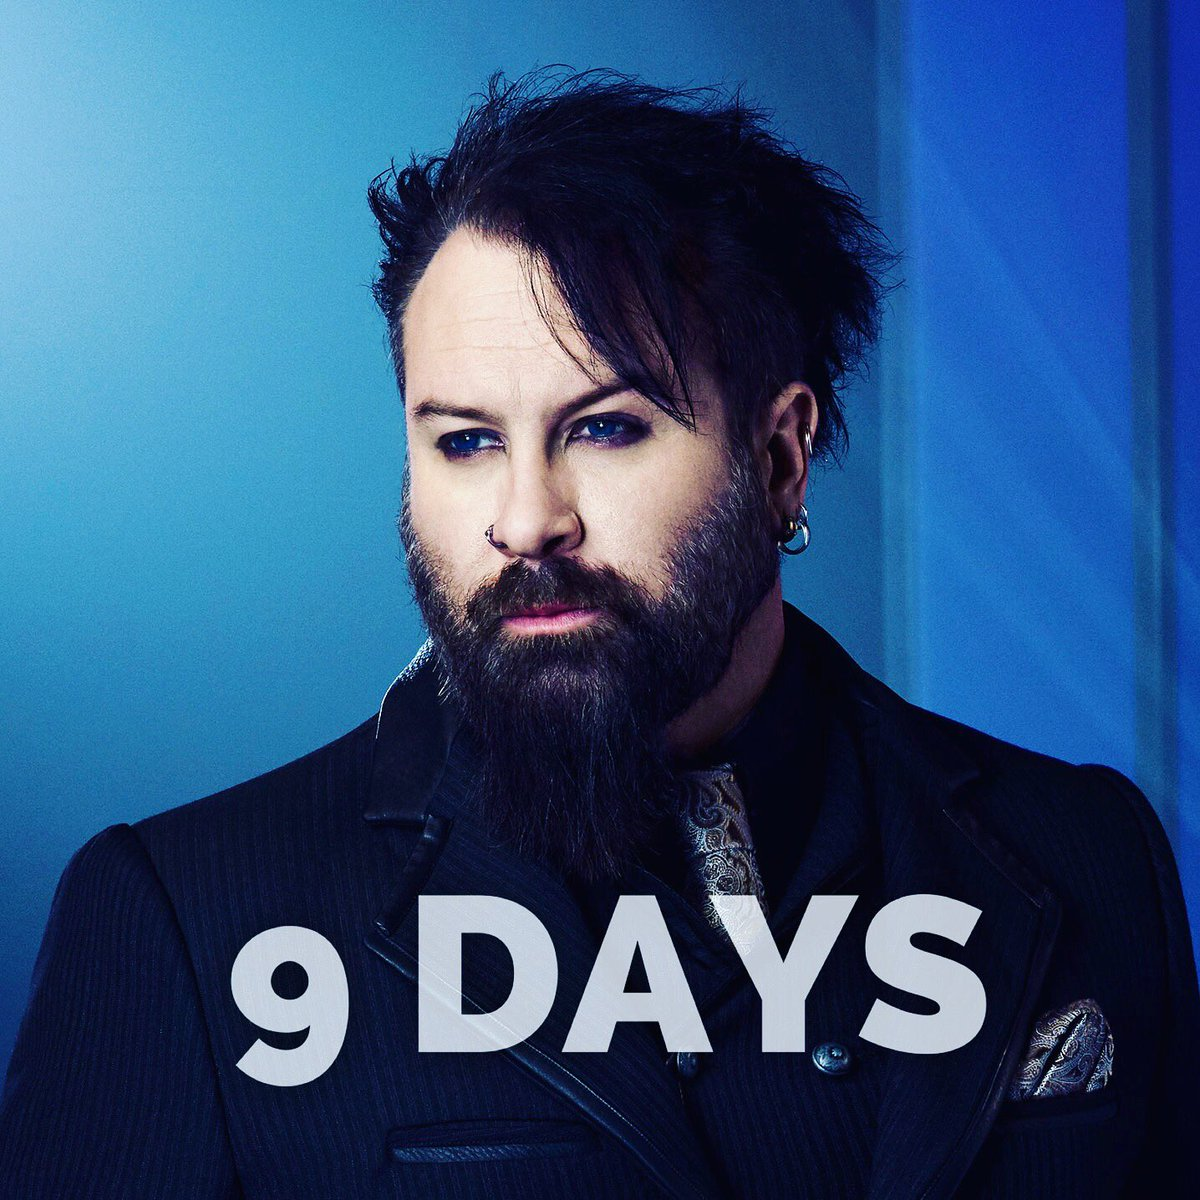 #FaceOffAllStars premieres in 9 days!  #FaceOff 1/24/17 @mckenziewestmor  @glenn_hetrick  @NevillePage  @VeNeill https://t.co/5K5rrWdR6g